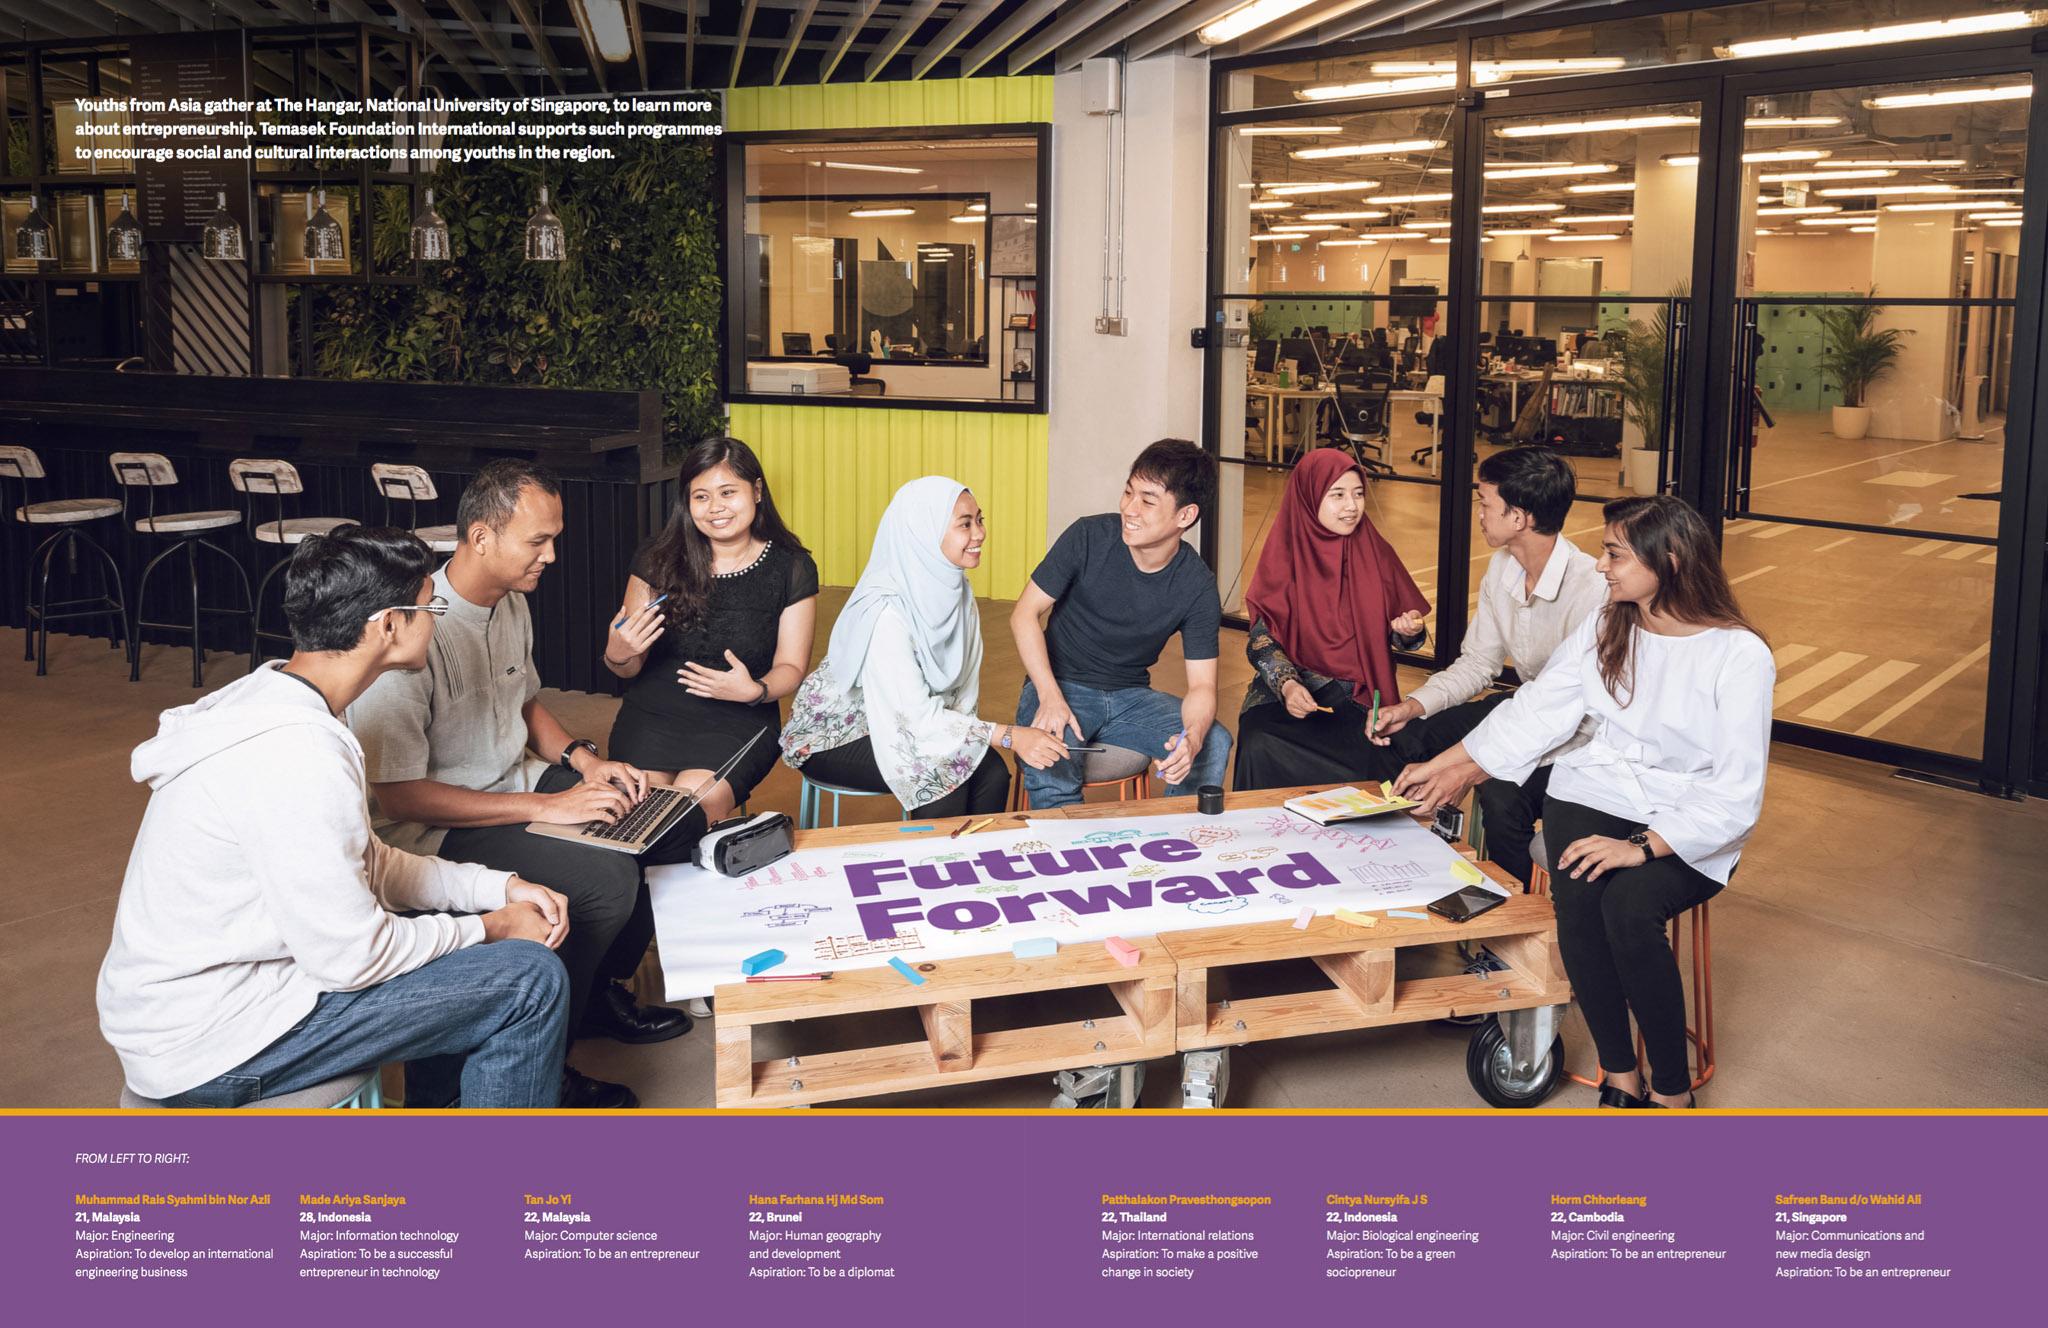 002TFI-AR-2018-Inside-singapore-photographer-editorial-commercial-2_02.jpg